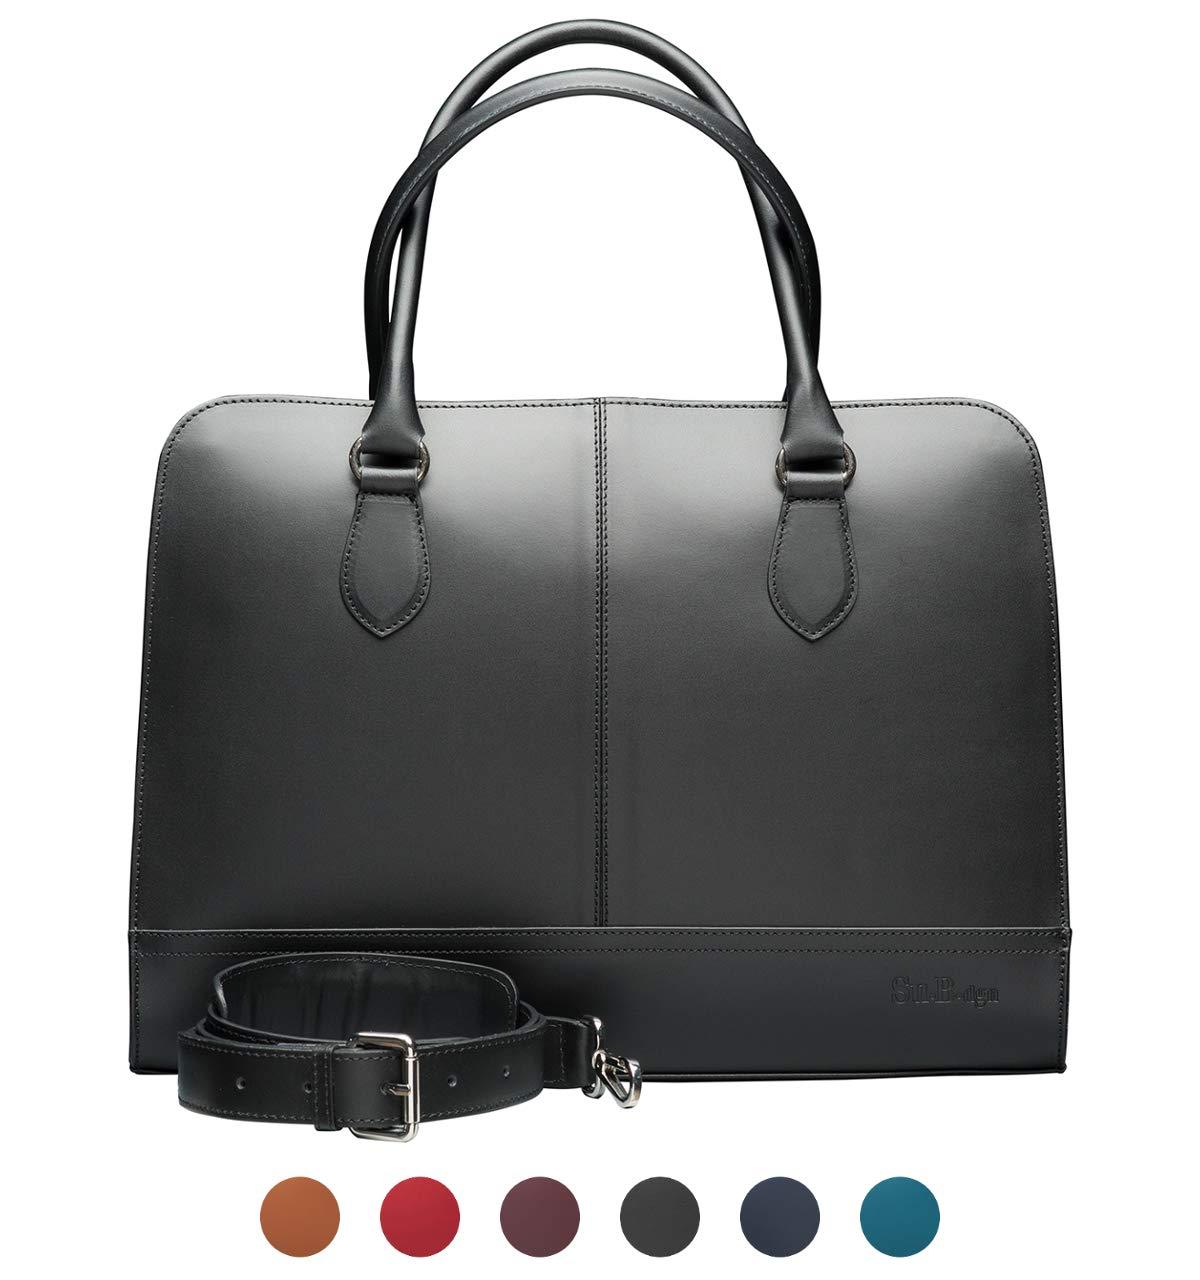 Su.B.dgn 15.6 Inch Laptop Bag with Trolley Strap for Women | Split Leather | Professional Designer Briefcase, Handbag, Messenger Bag | Black - Made in Italy